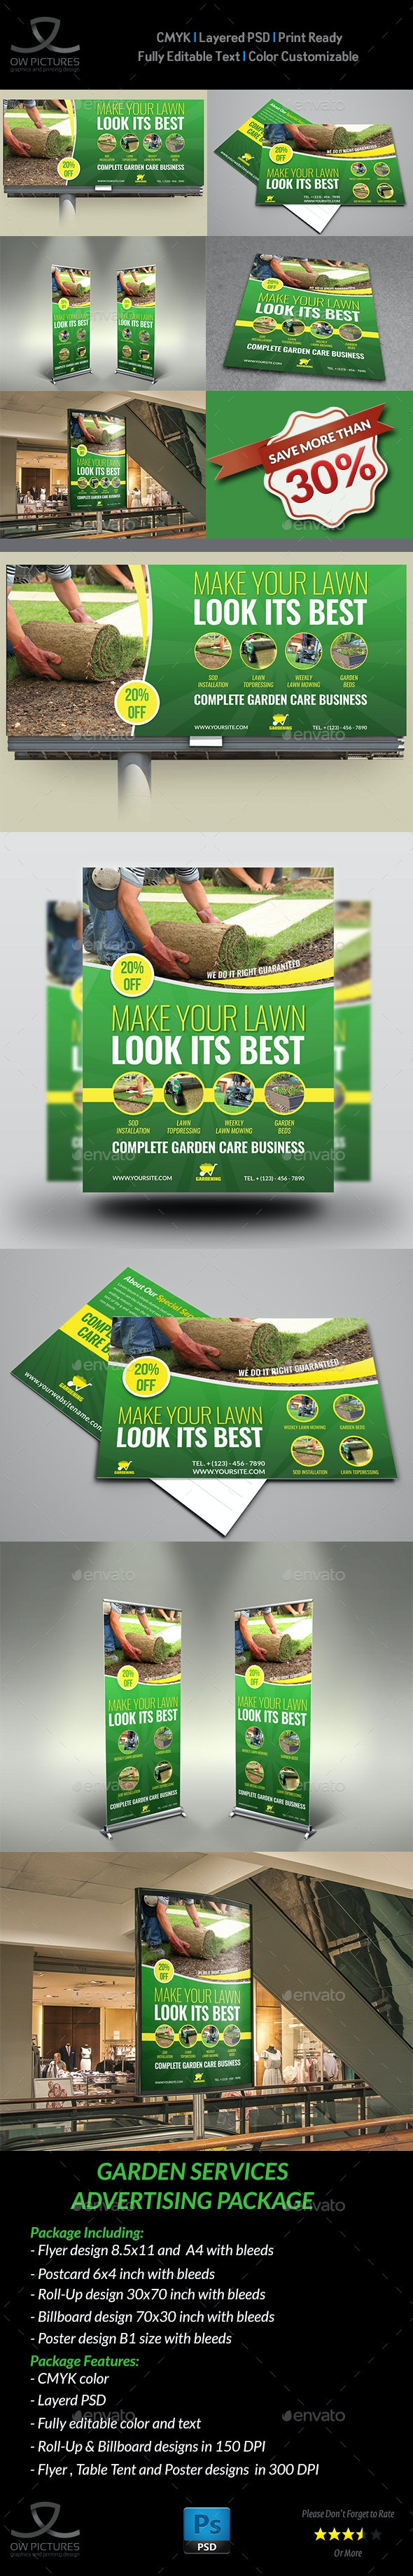 Garden Services Advertising Bundle Vol.2 - Signage Print Templates